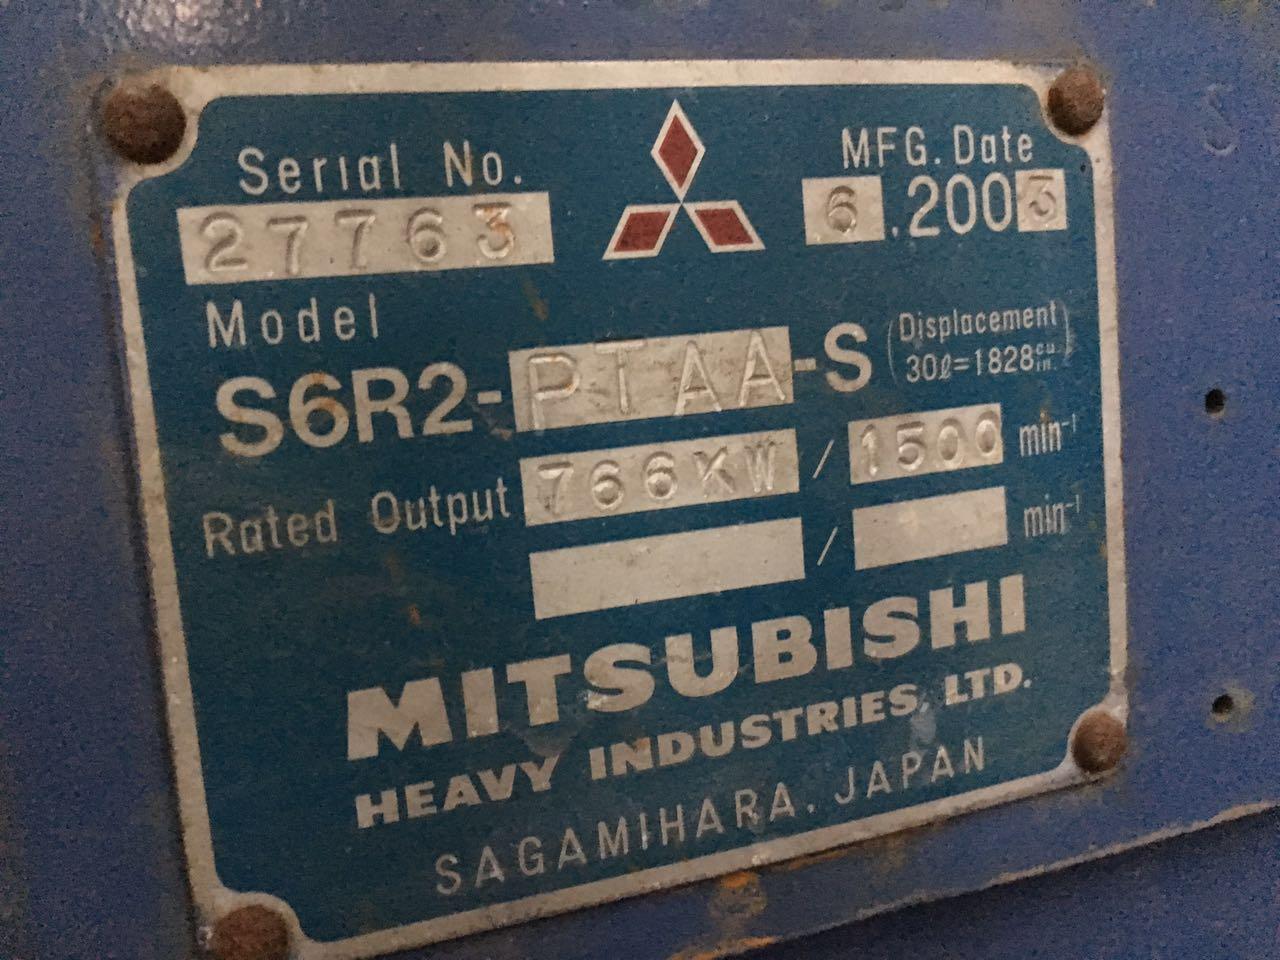 704kw Mitsubishi used diesel generator engine mark